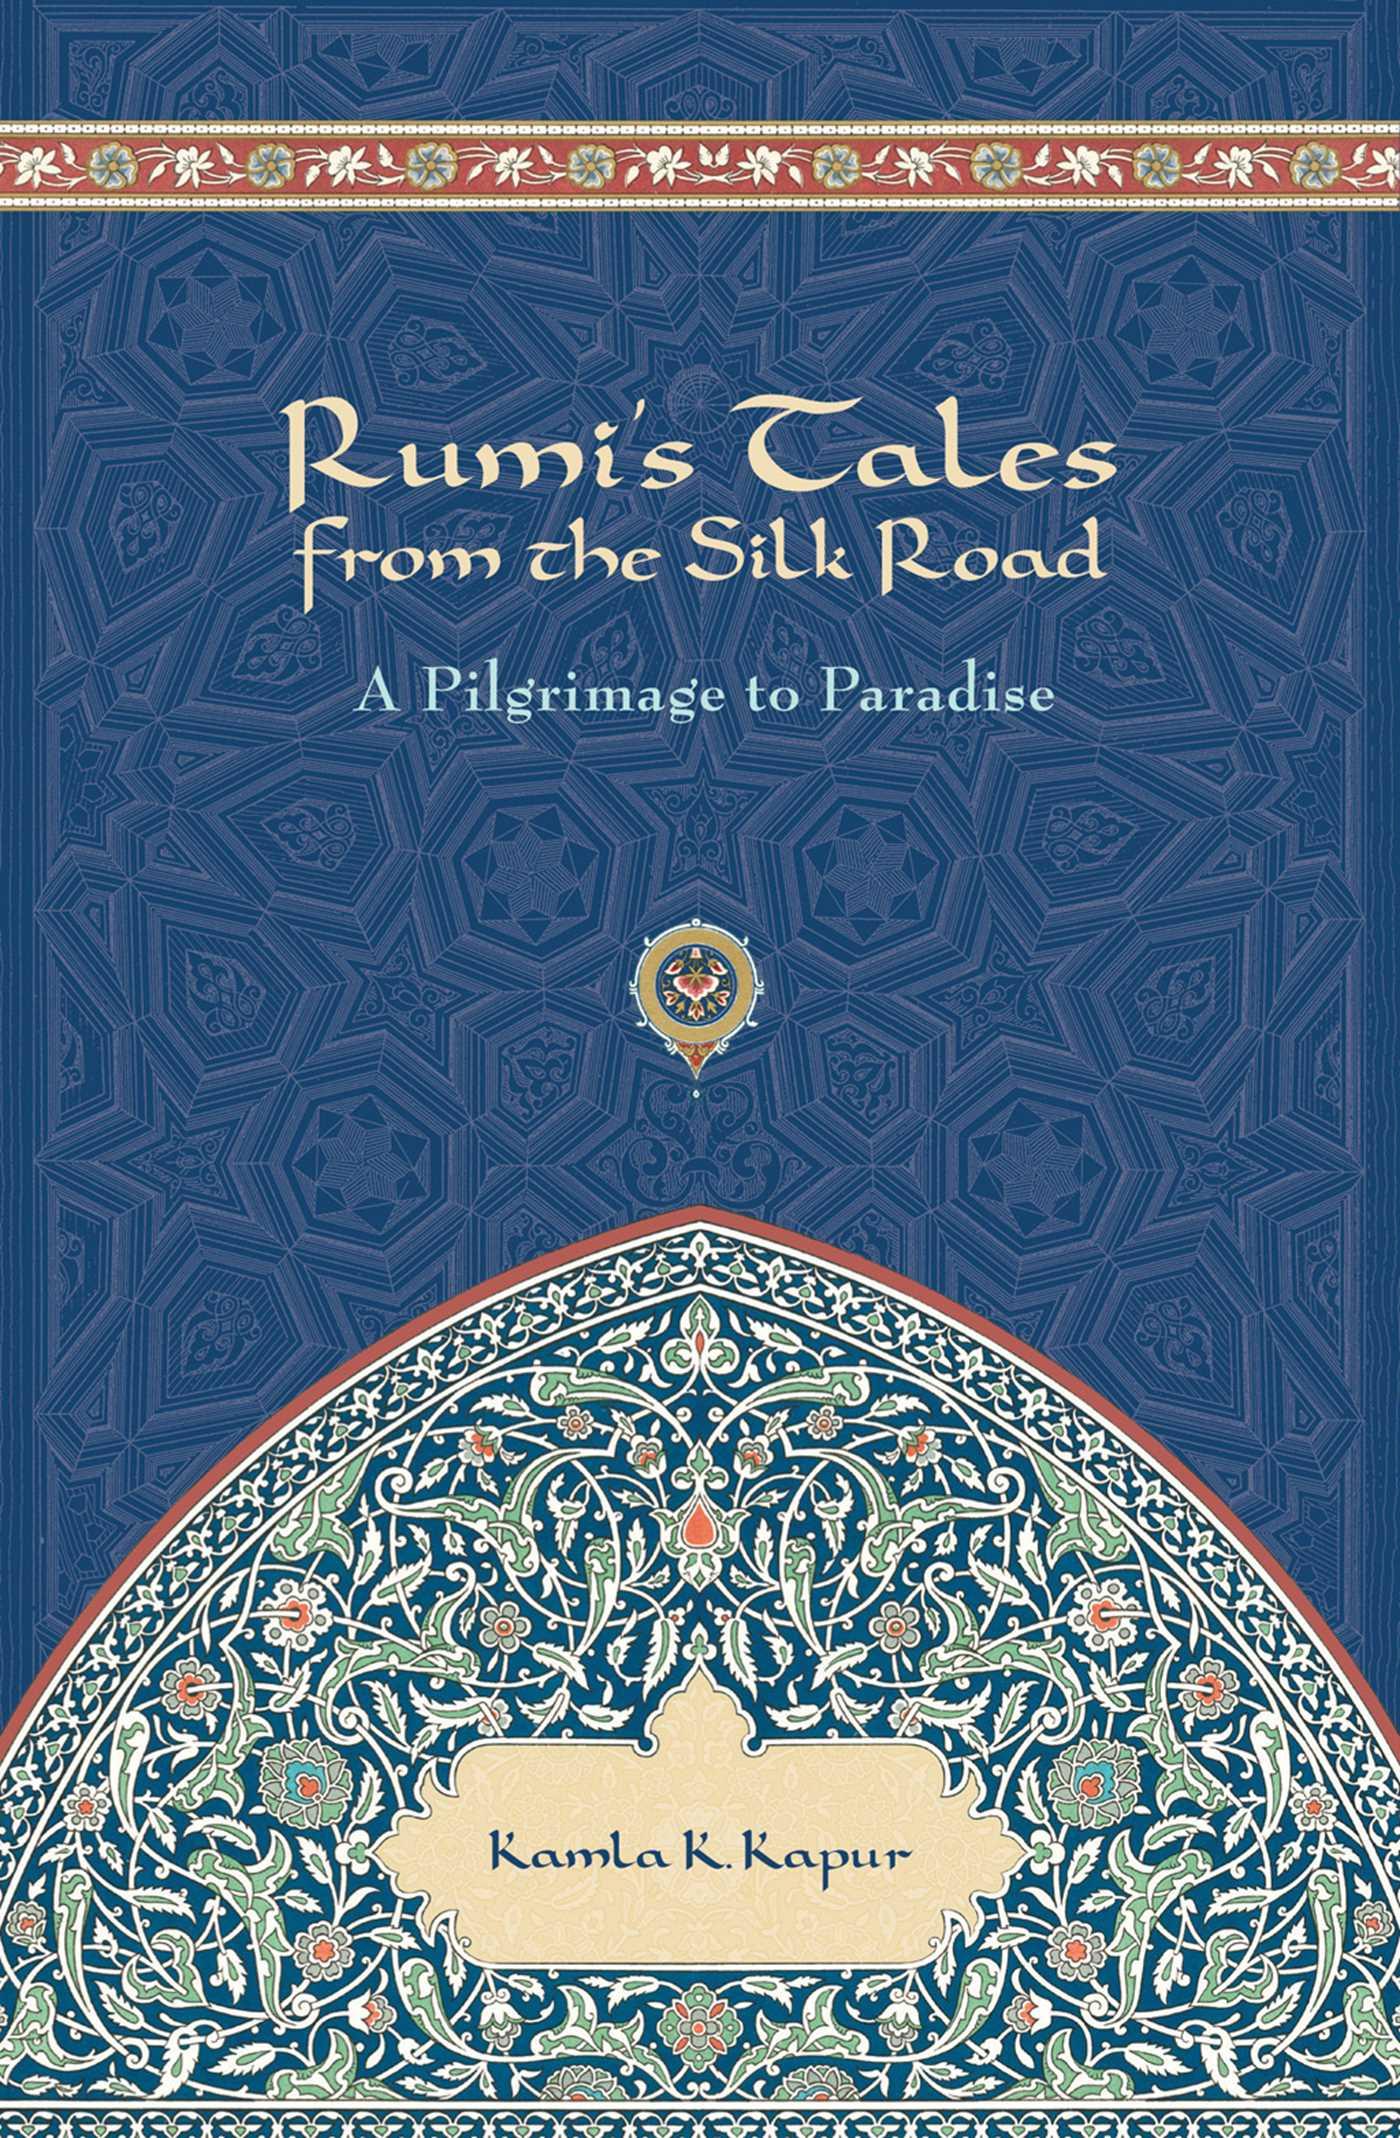 rumi 39 s tales from the silk road book by kamla k kapur. Black Bedroom Furniture Sets. Home Design Ideas